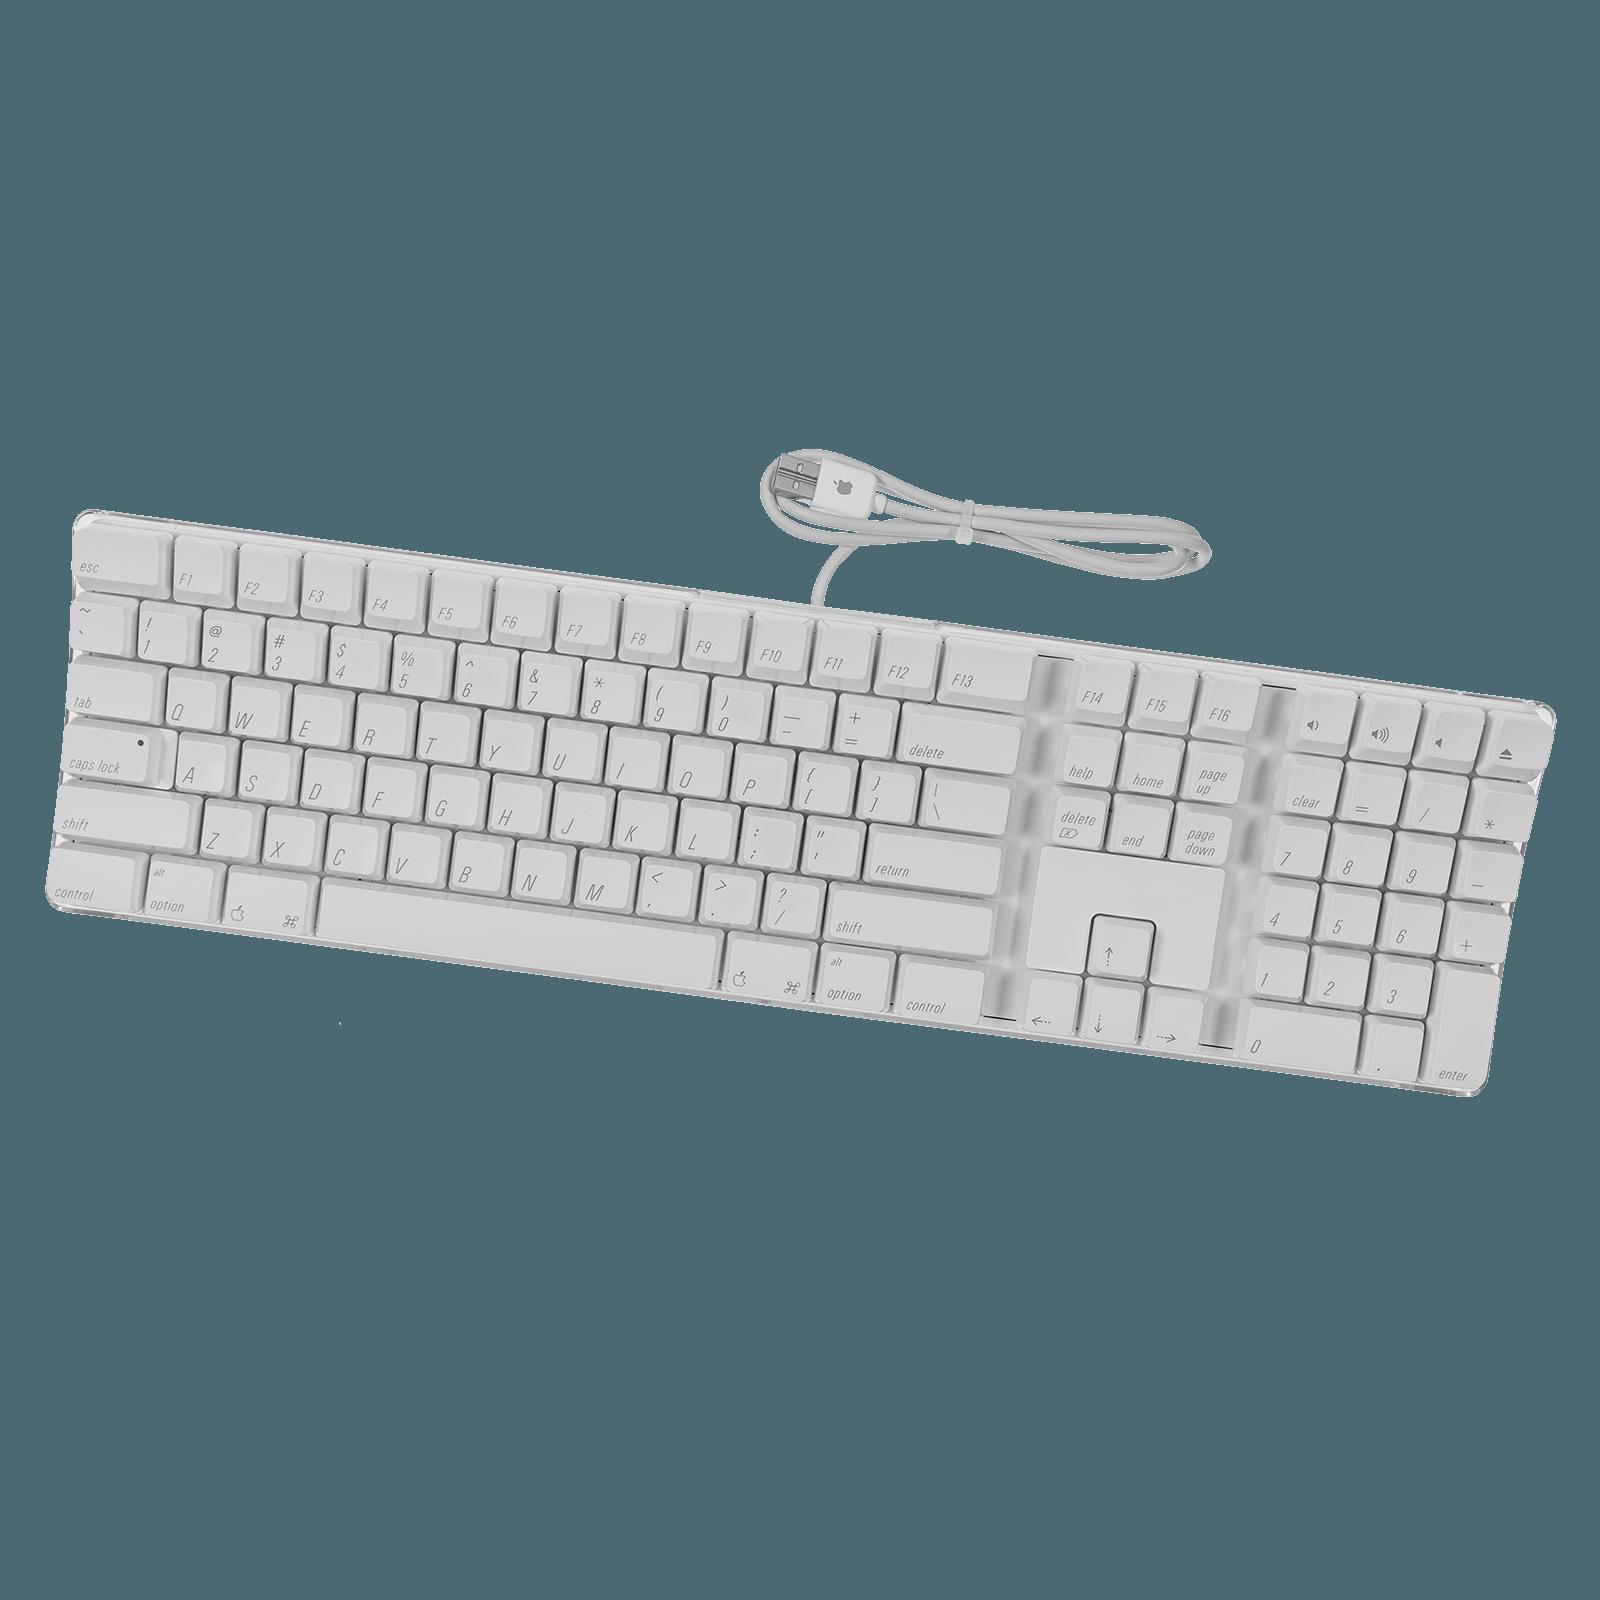 Apple Wired Keyboard + Numeric Keypad & USB Ports (A1048)